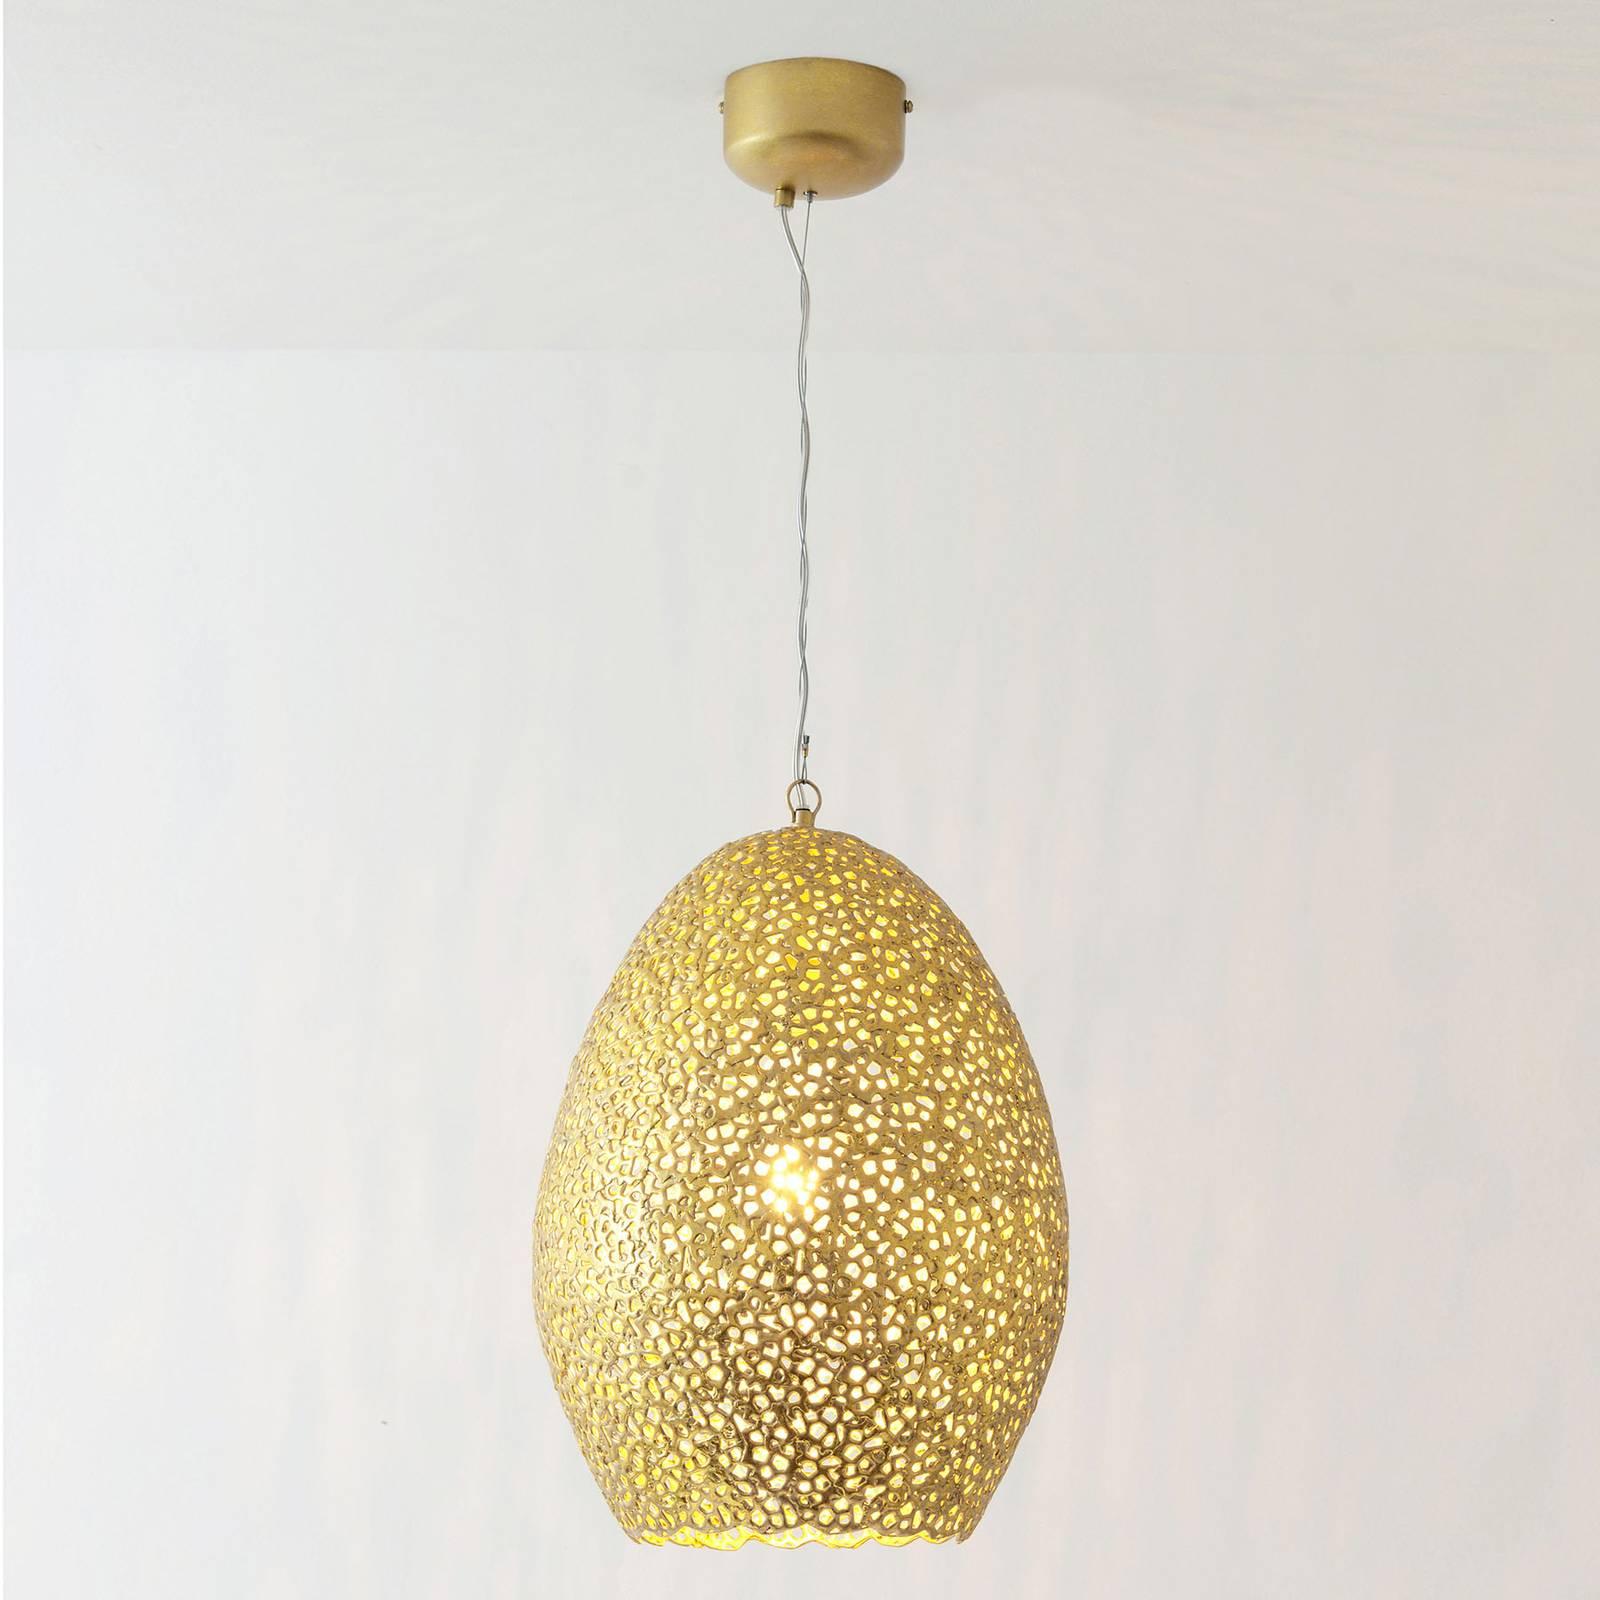 Riippuvalo Cavalliere, kulta, Ø 34 cm